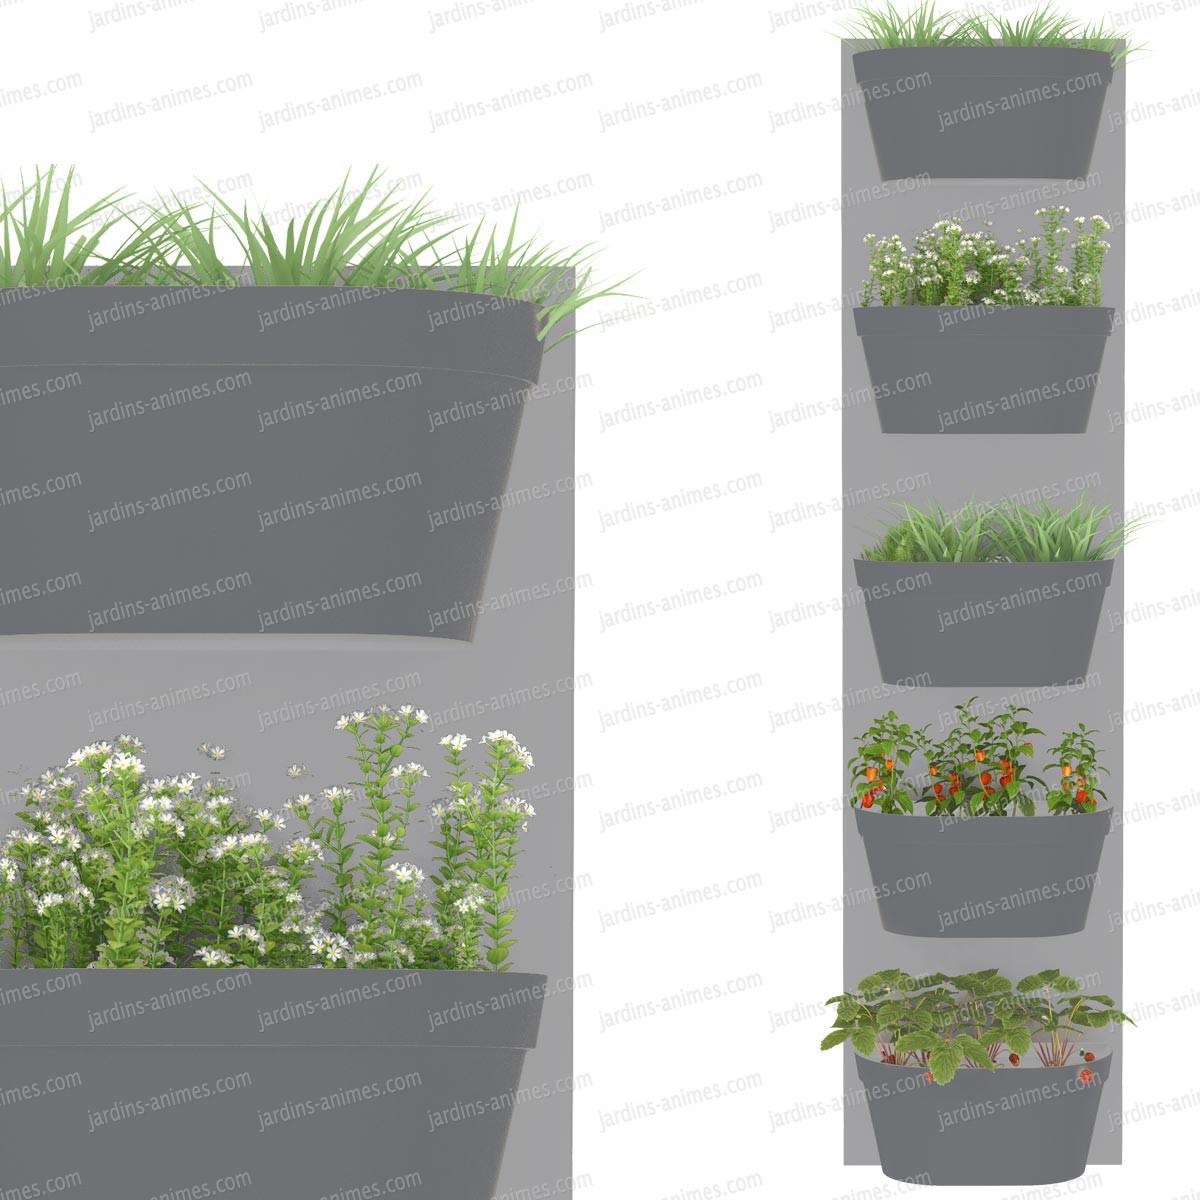 Jardin vertical 5 bacs fond gris clair bac anthracite for Jardin mur gris